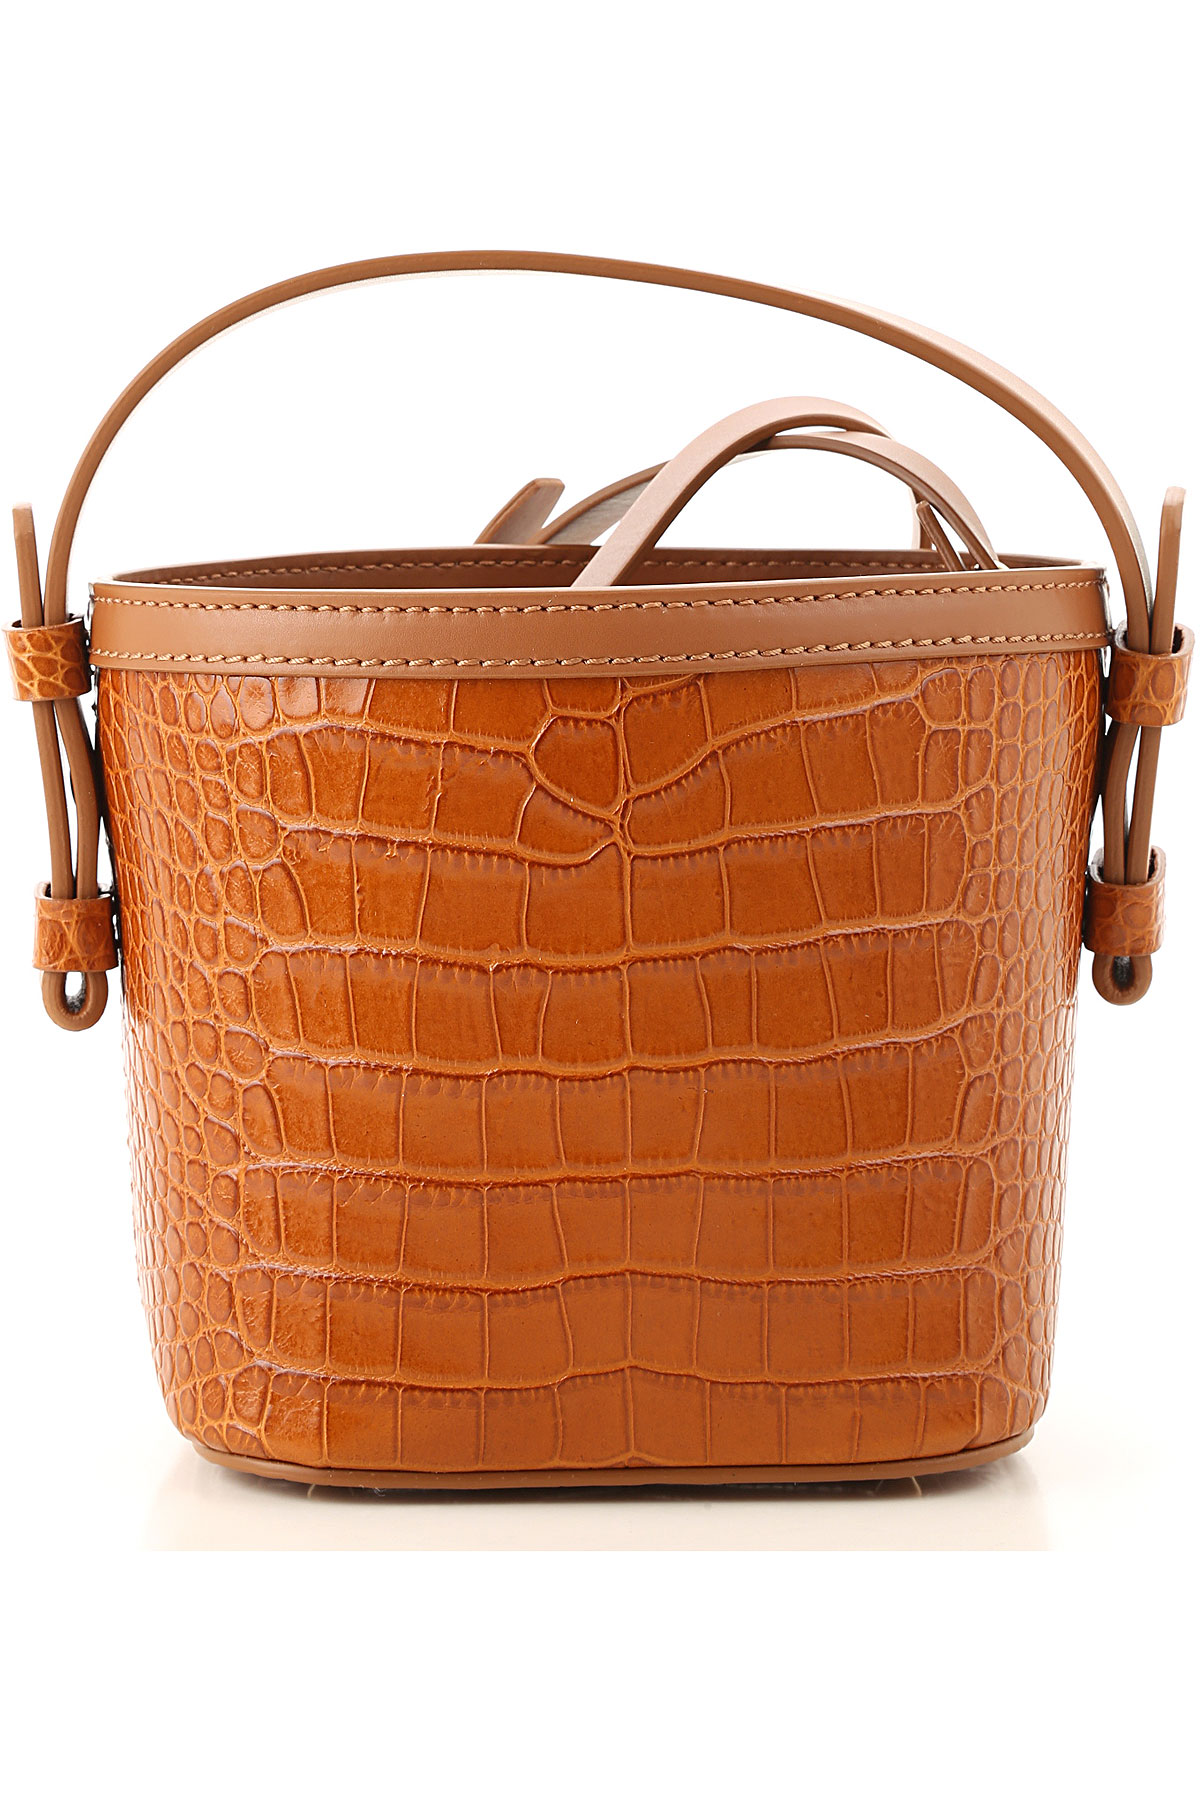 Nico Giani Shoulder Bag for Women On Sale, Brown, Leather, 2019